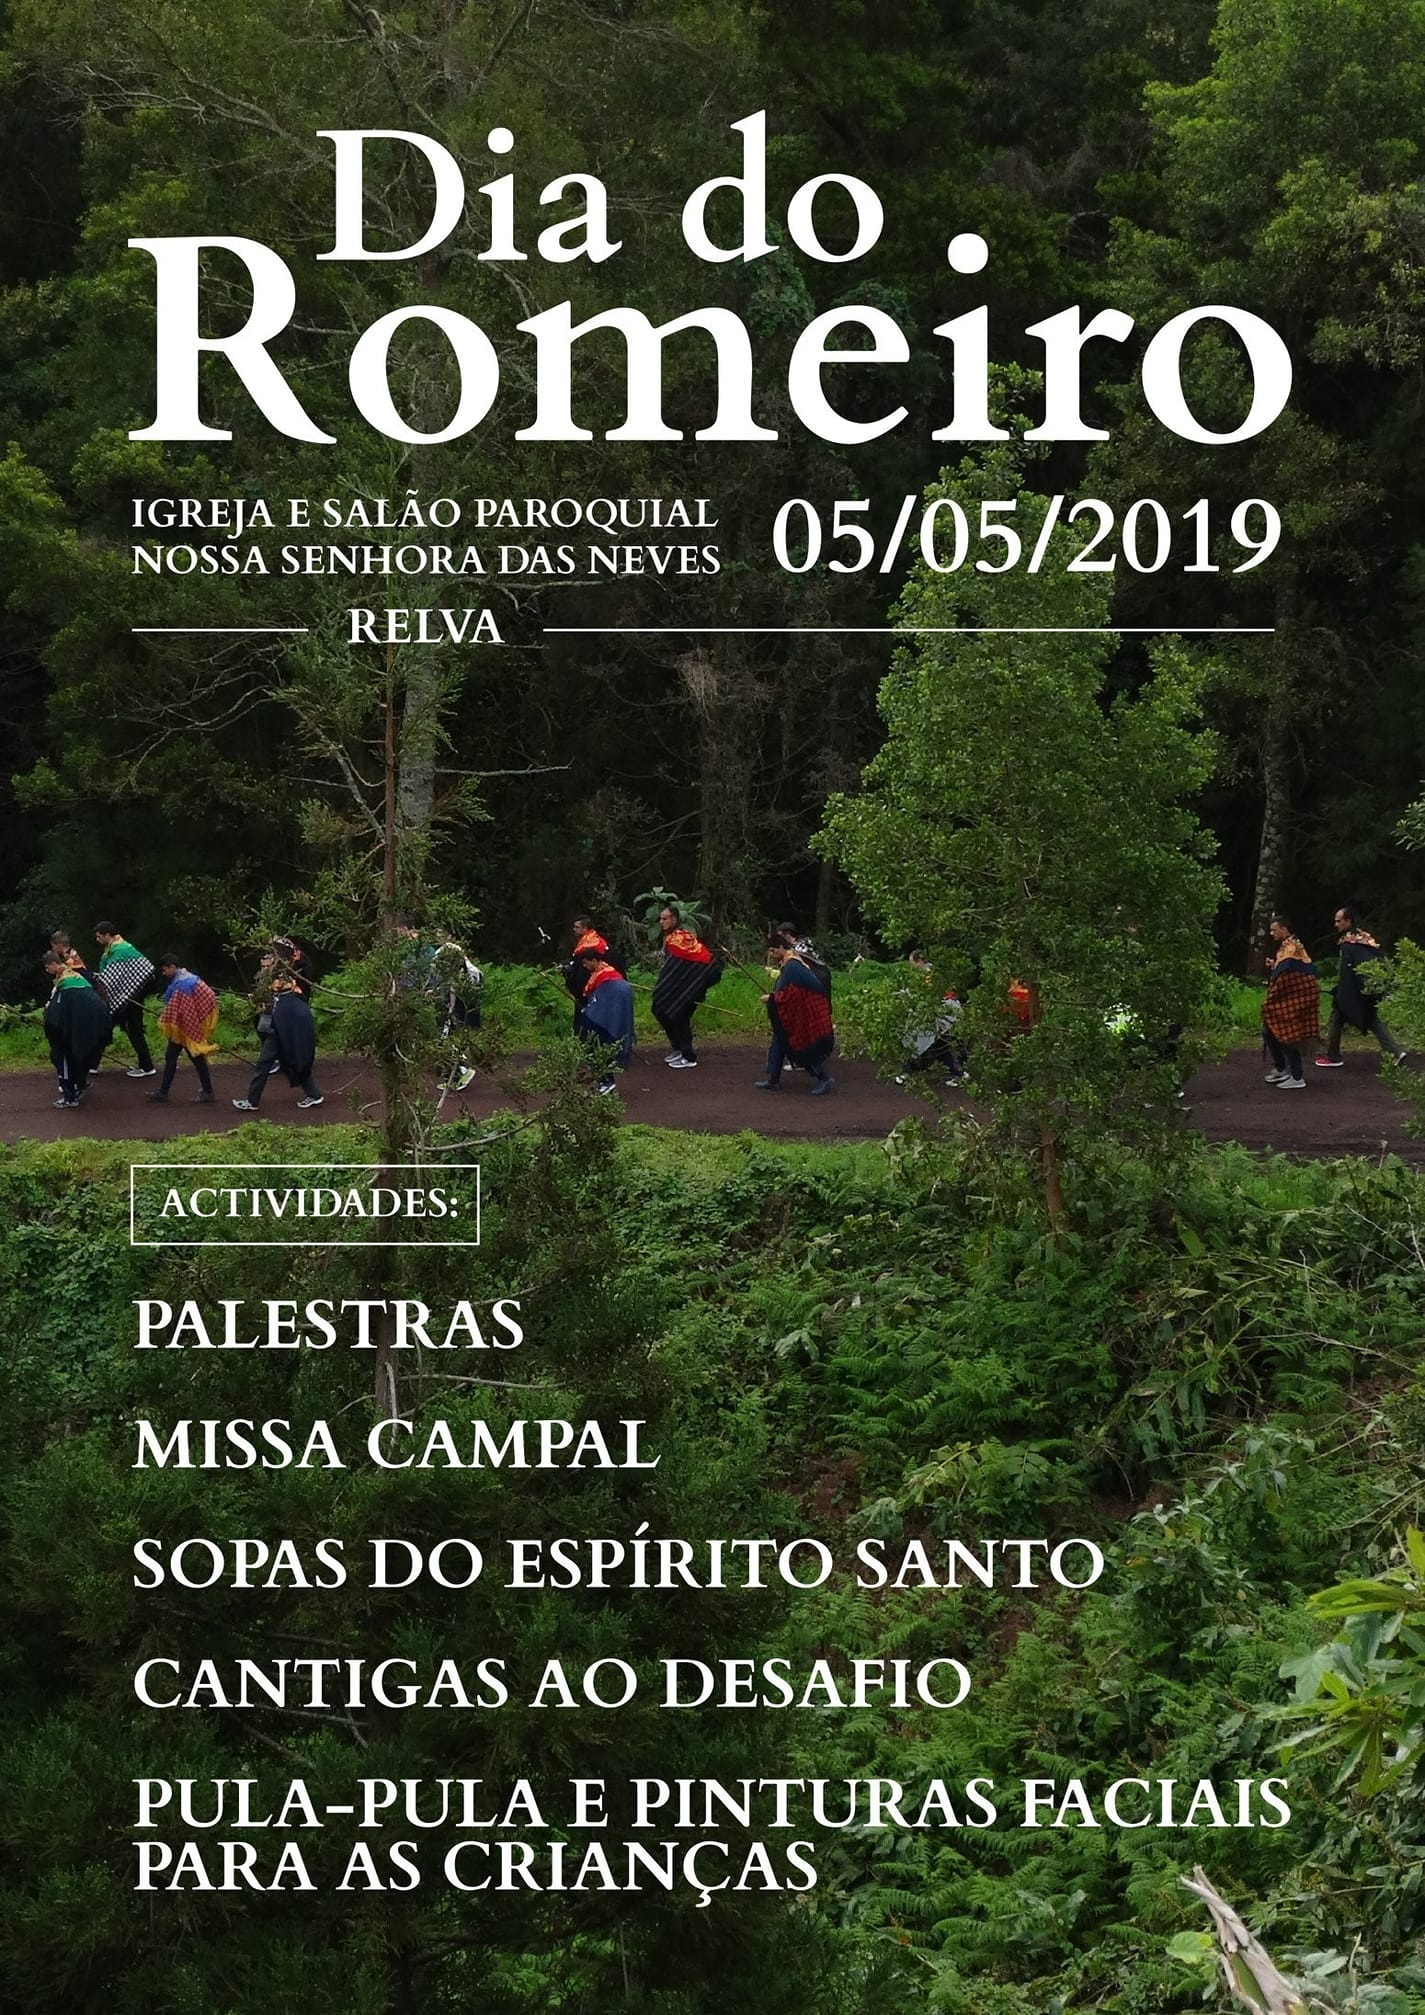 Dia do Romeiro